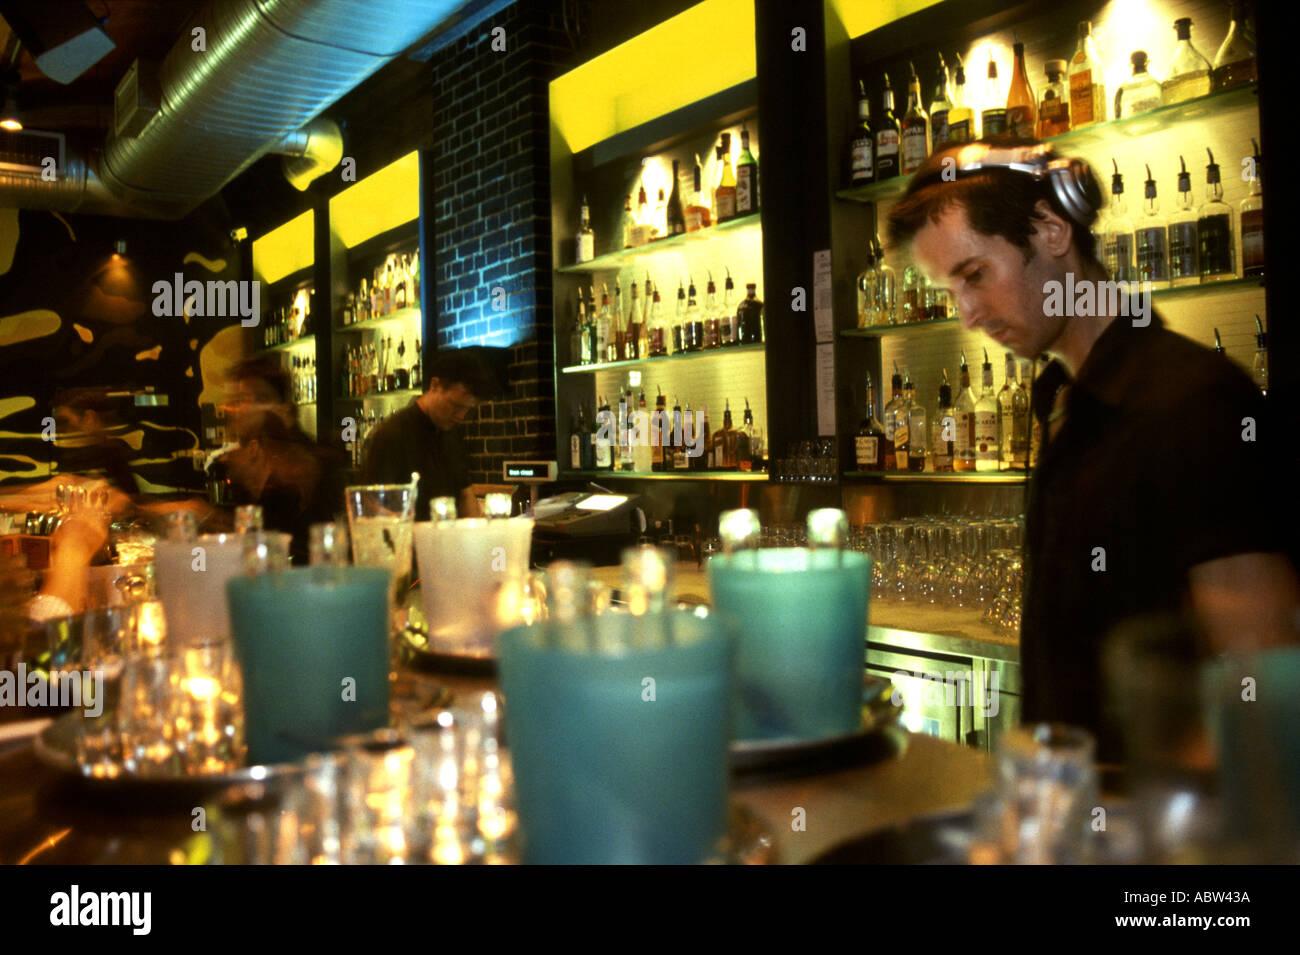 Drink Cocktail Glass Bar Restaurant London Interior